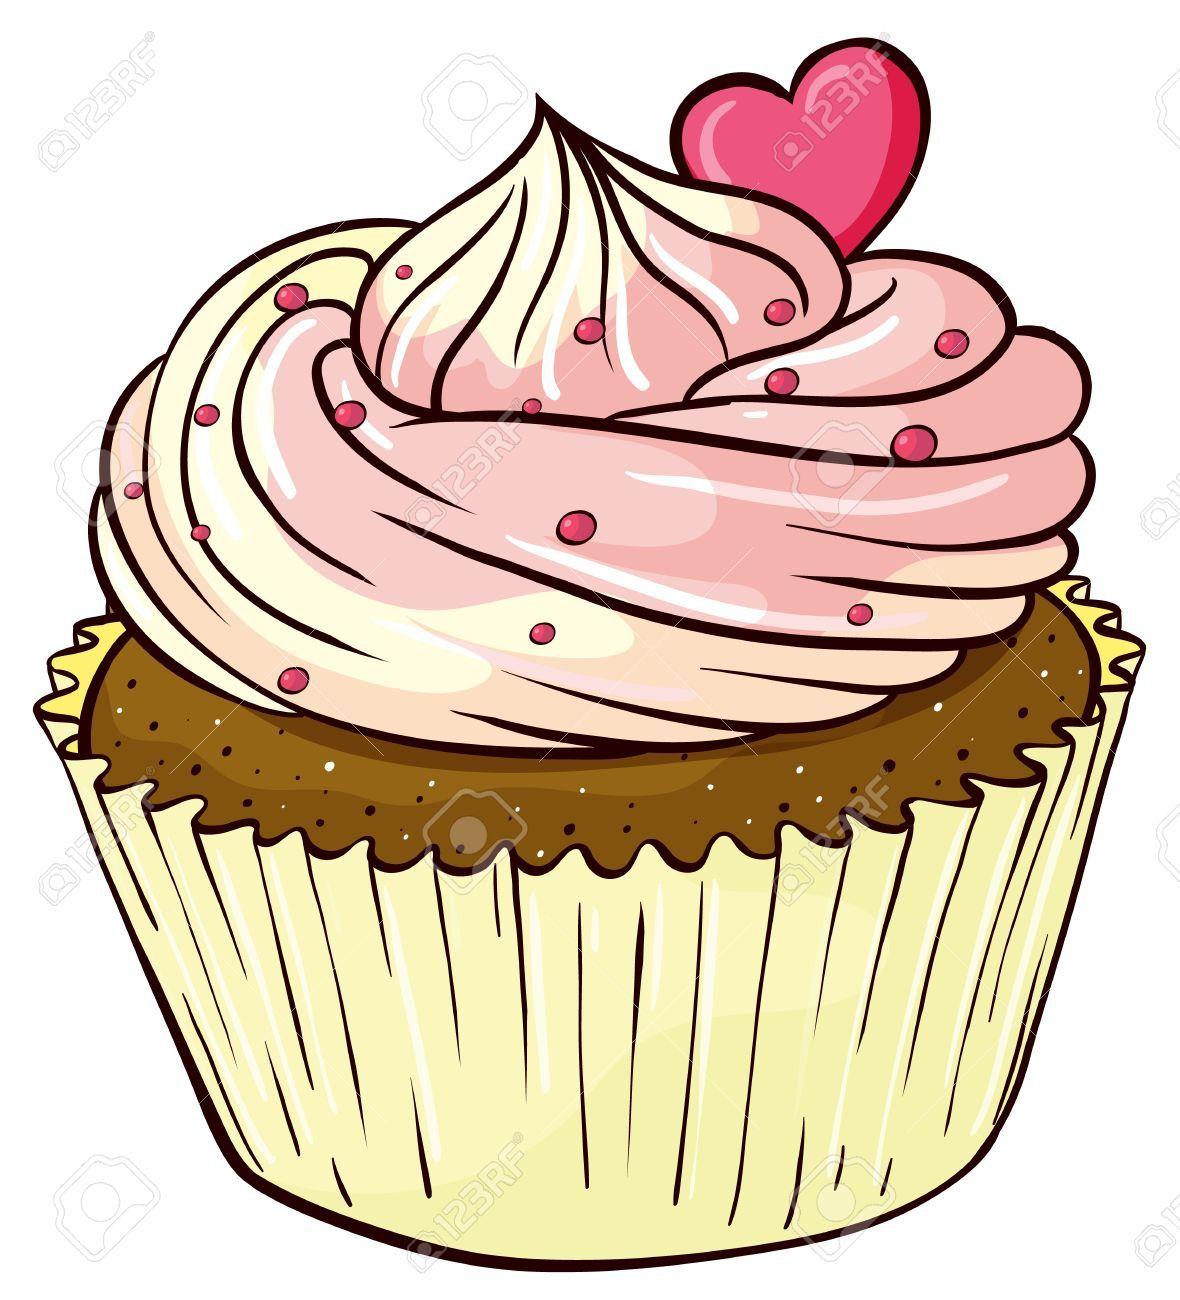 Cupcake Clipart Stock Photos Images, Royalty Free Cupcake ...